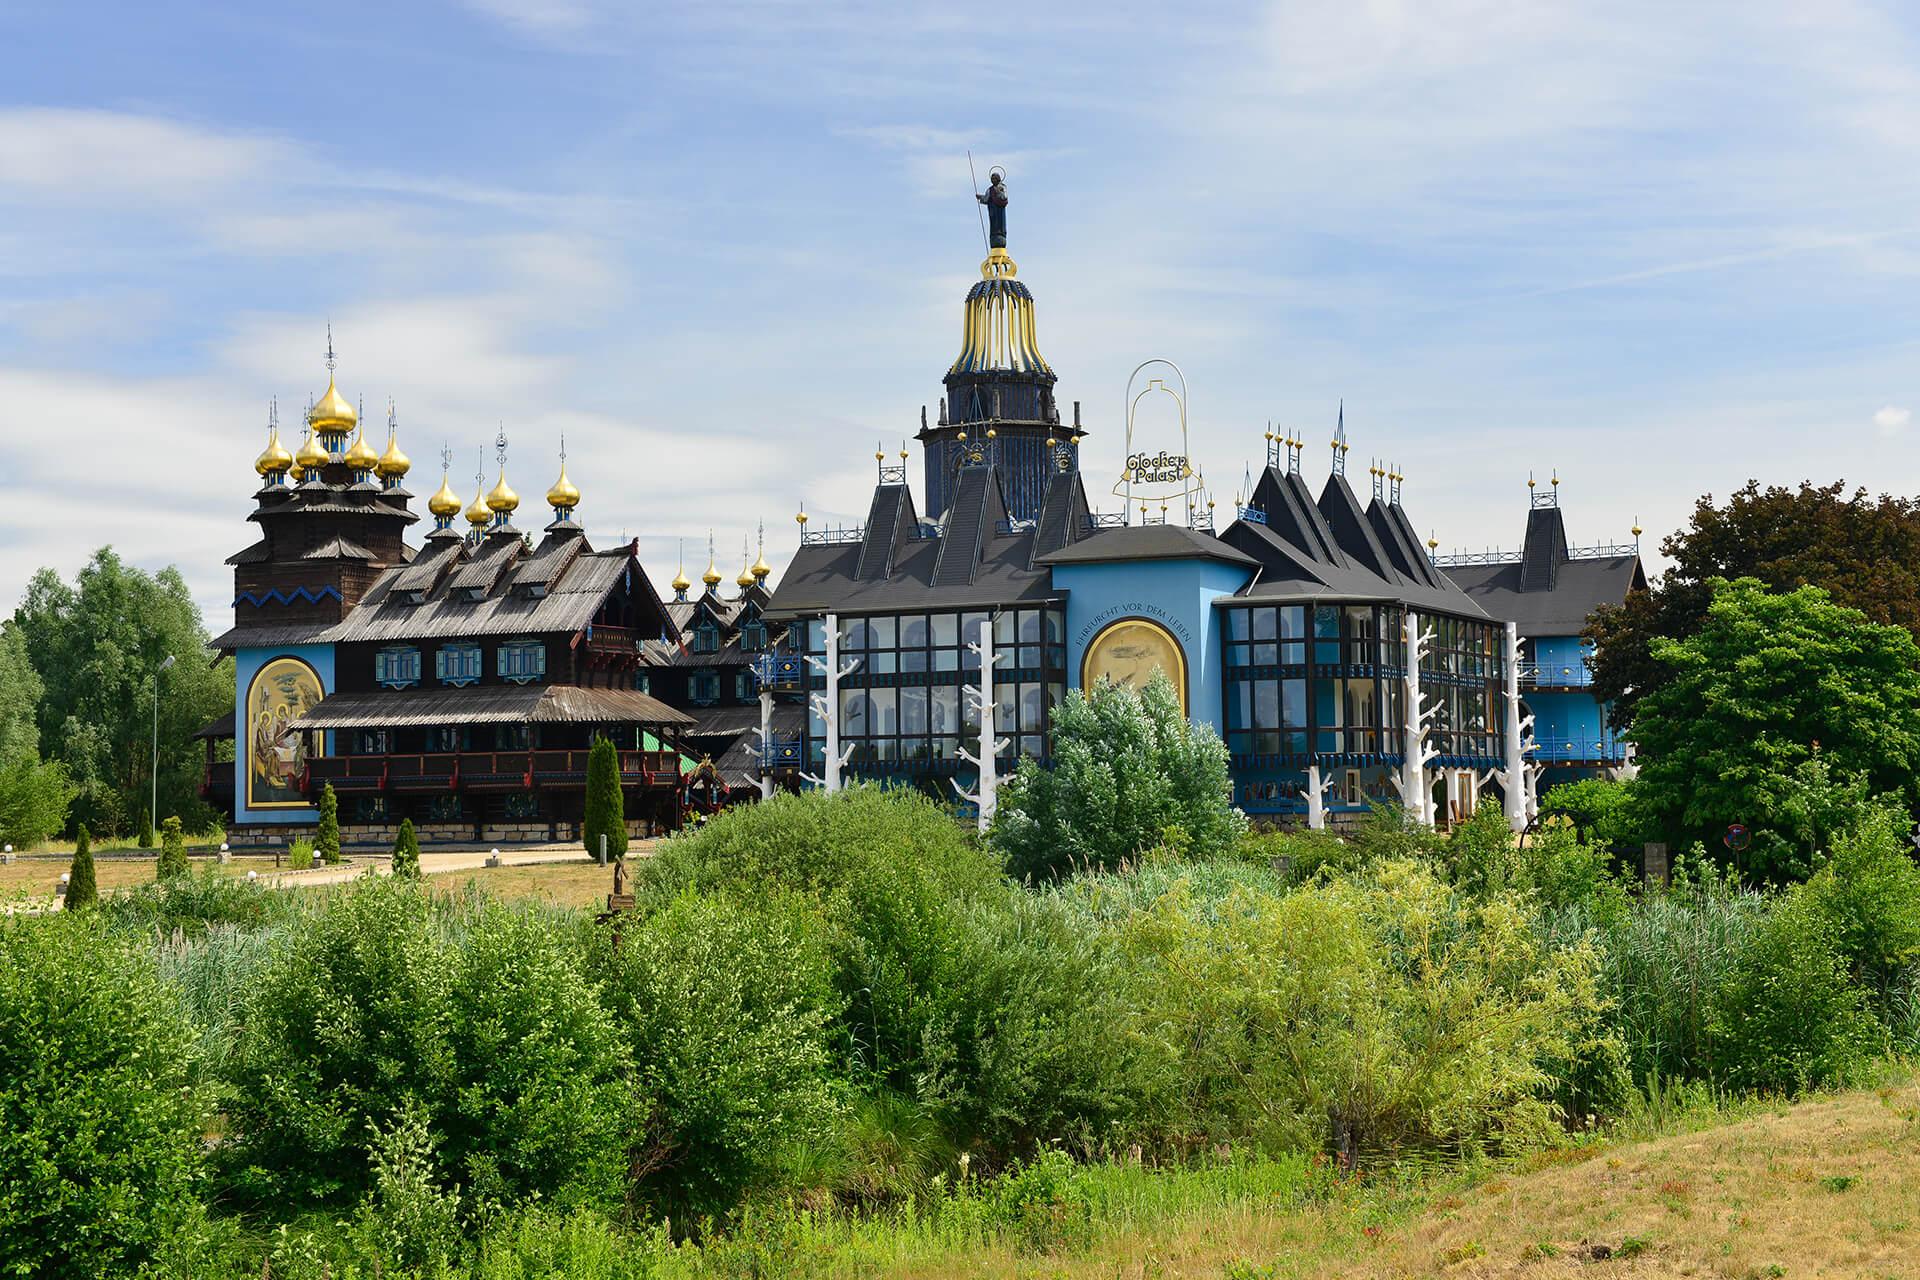 Blick auf den Glocken-Palast